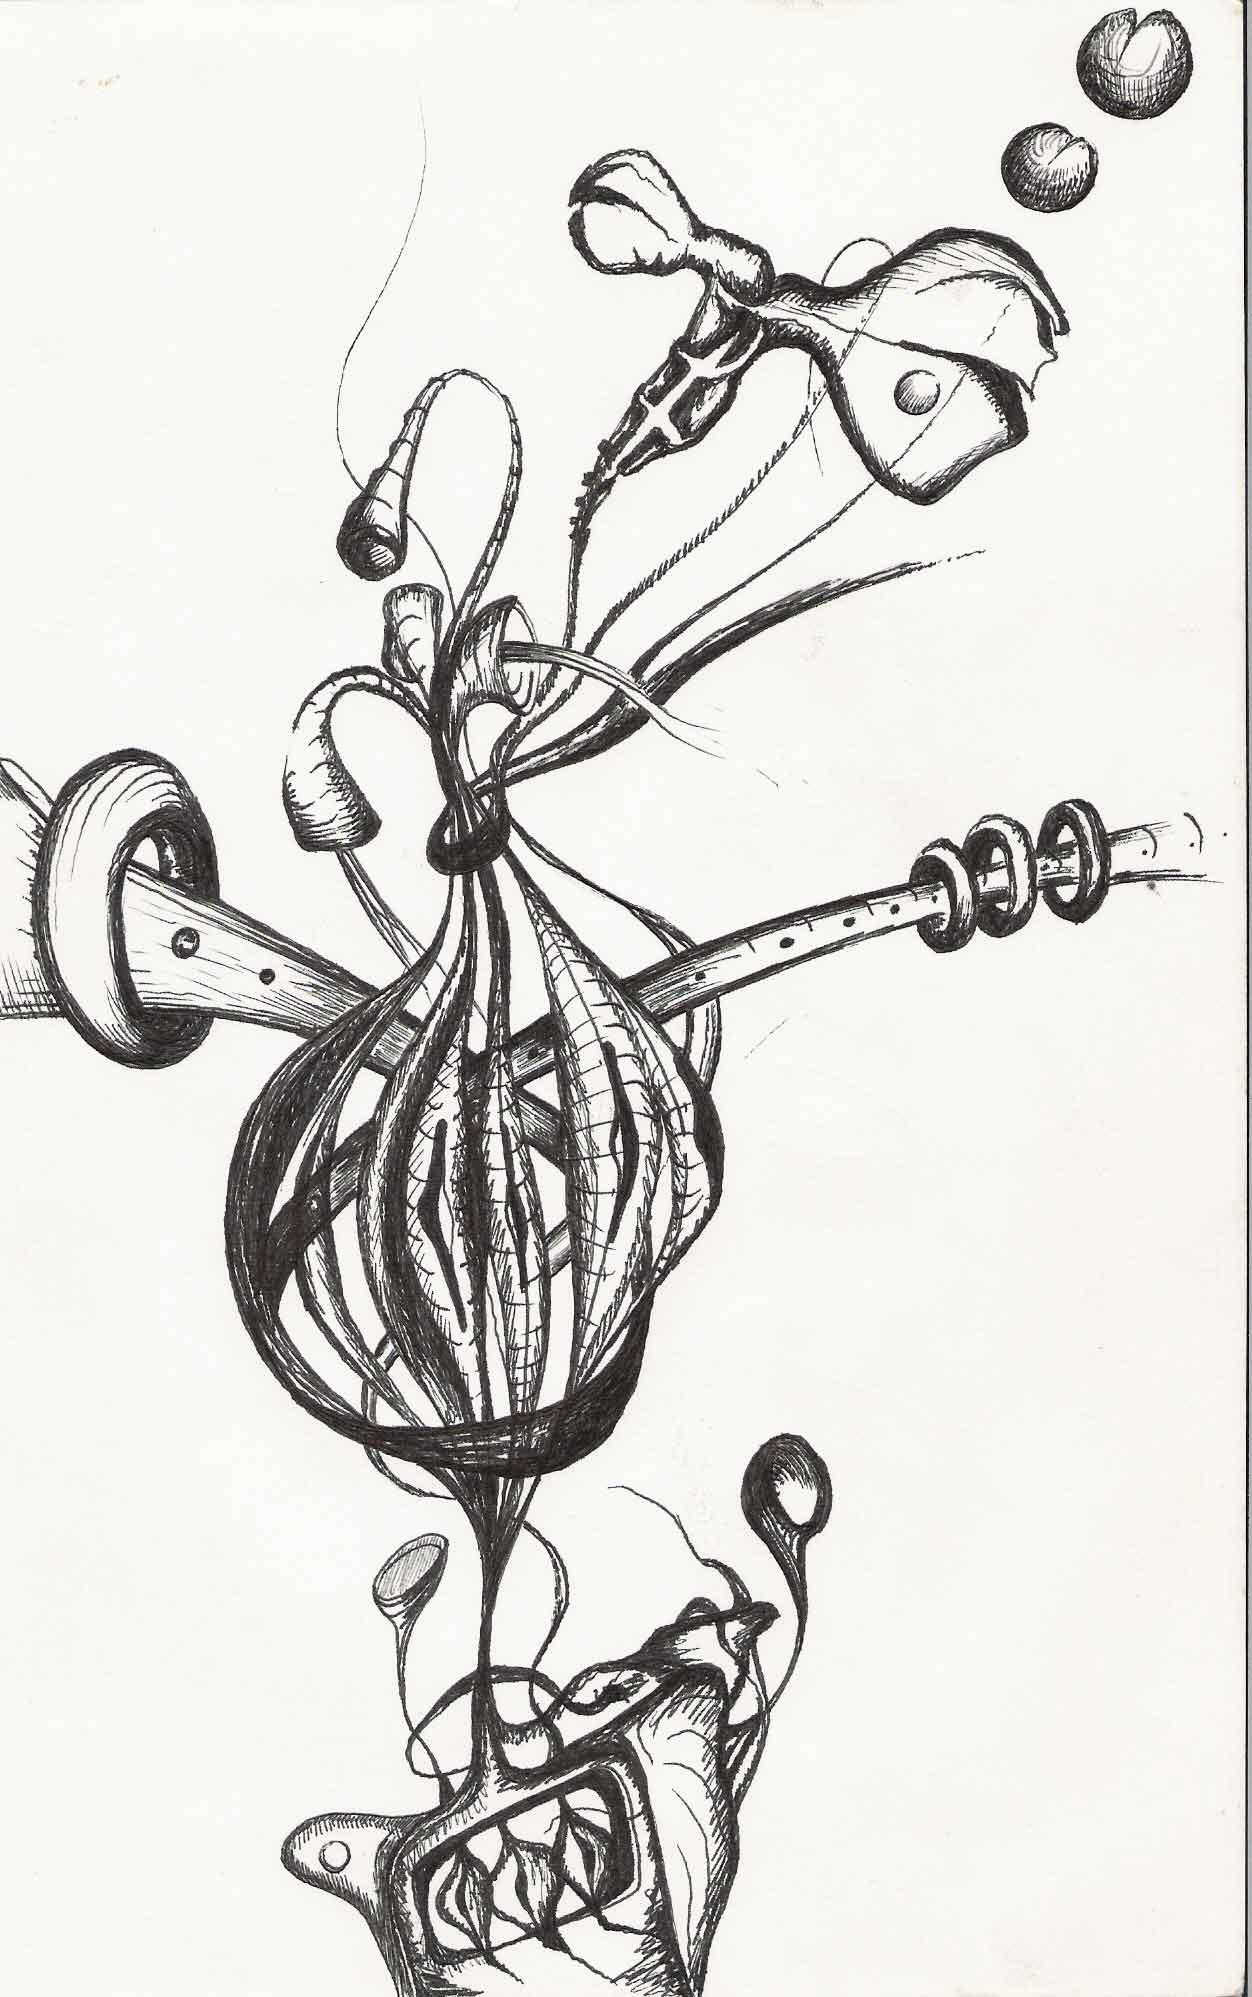 sketch-10-sept-05.jpg